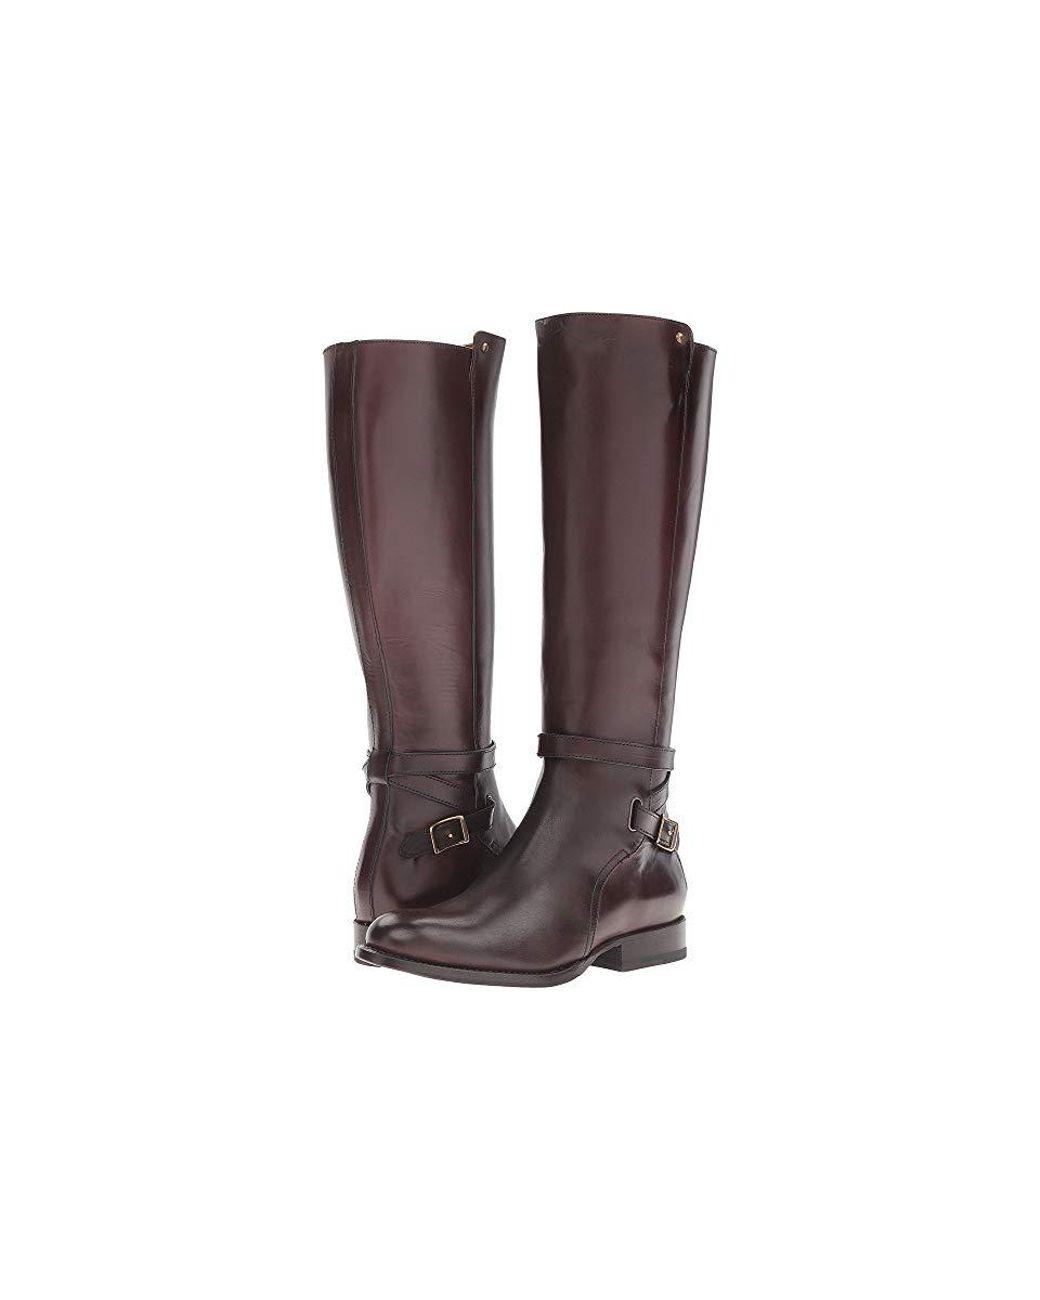 énorme réduction 5015b c9162 Frye Jordan Strap Tall (dark Brown Smooth Veg Calf) Dress ...